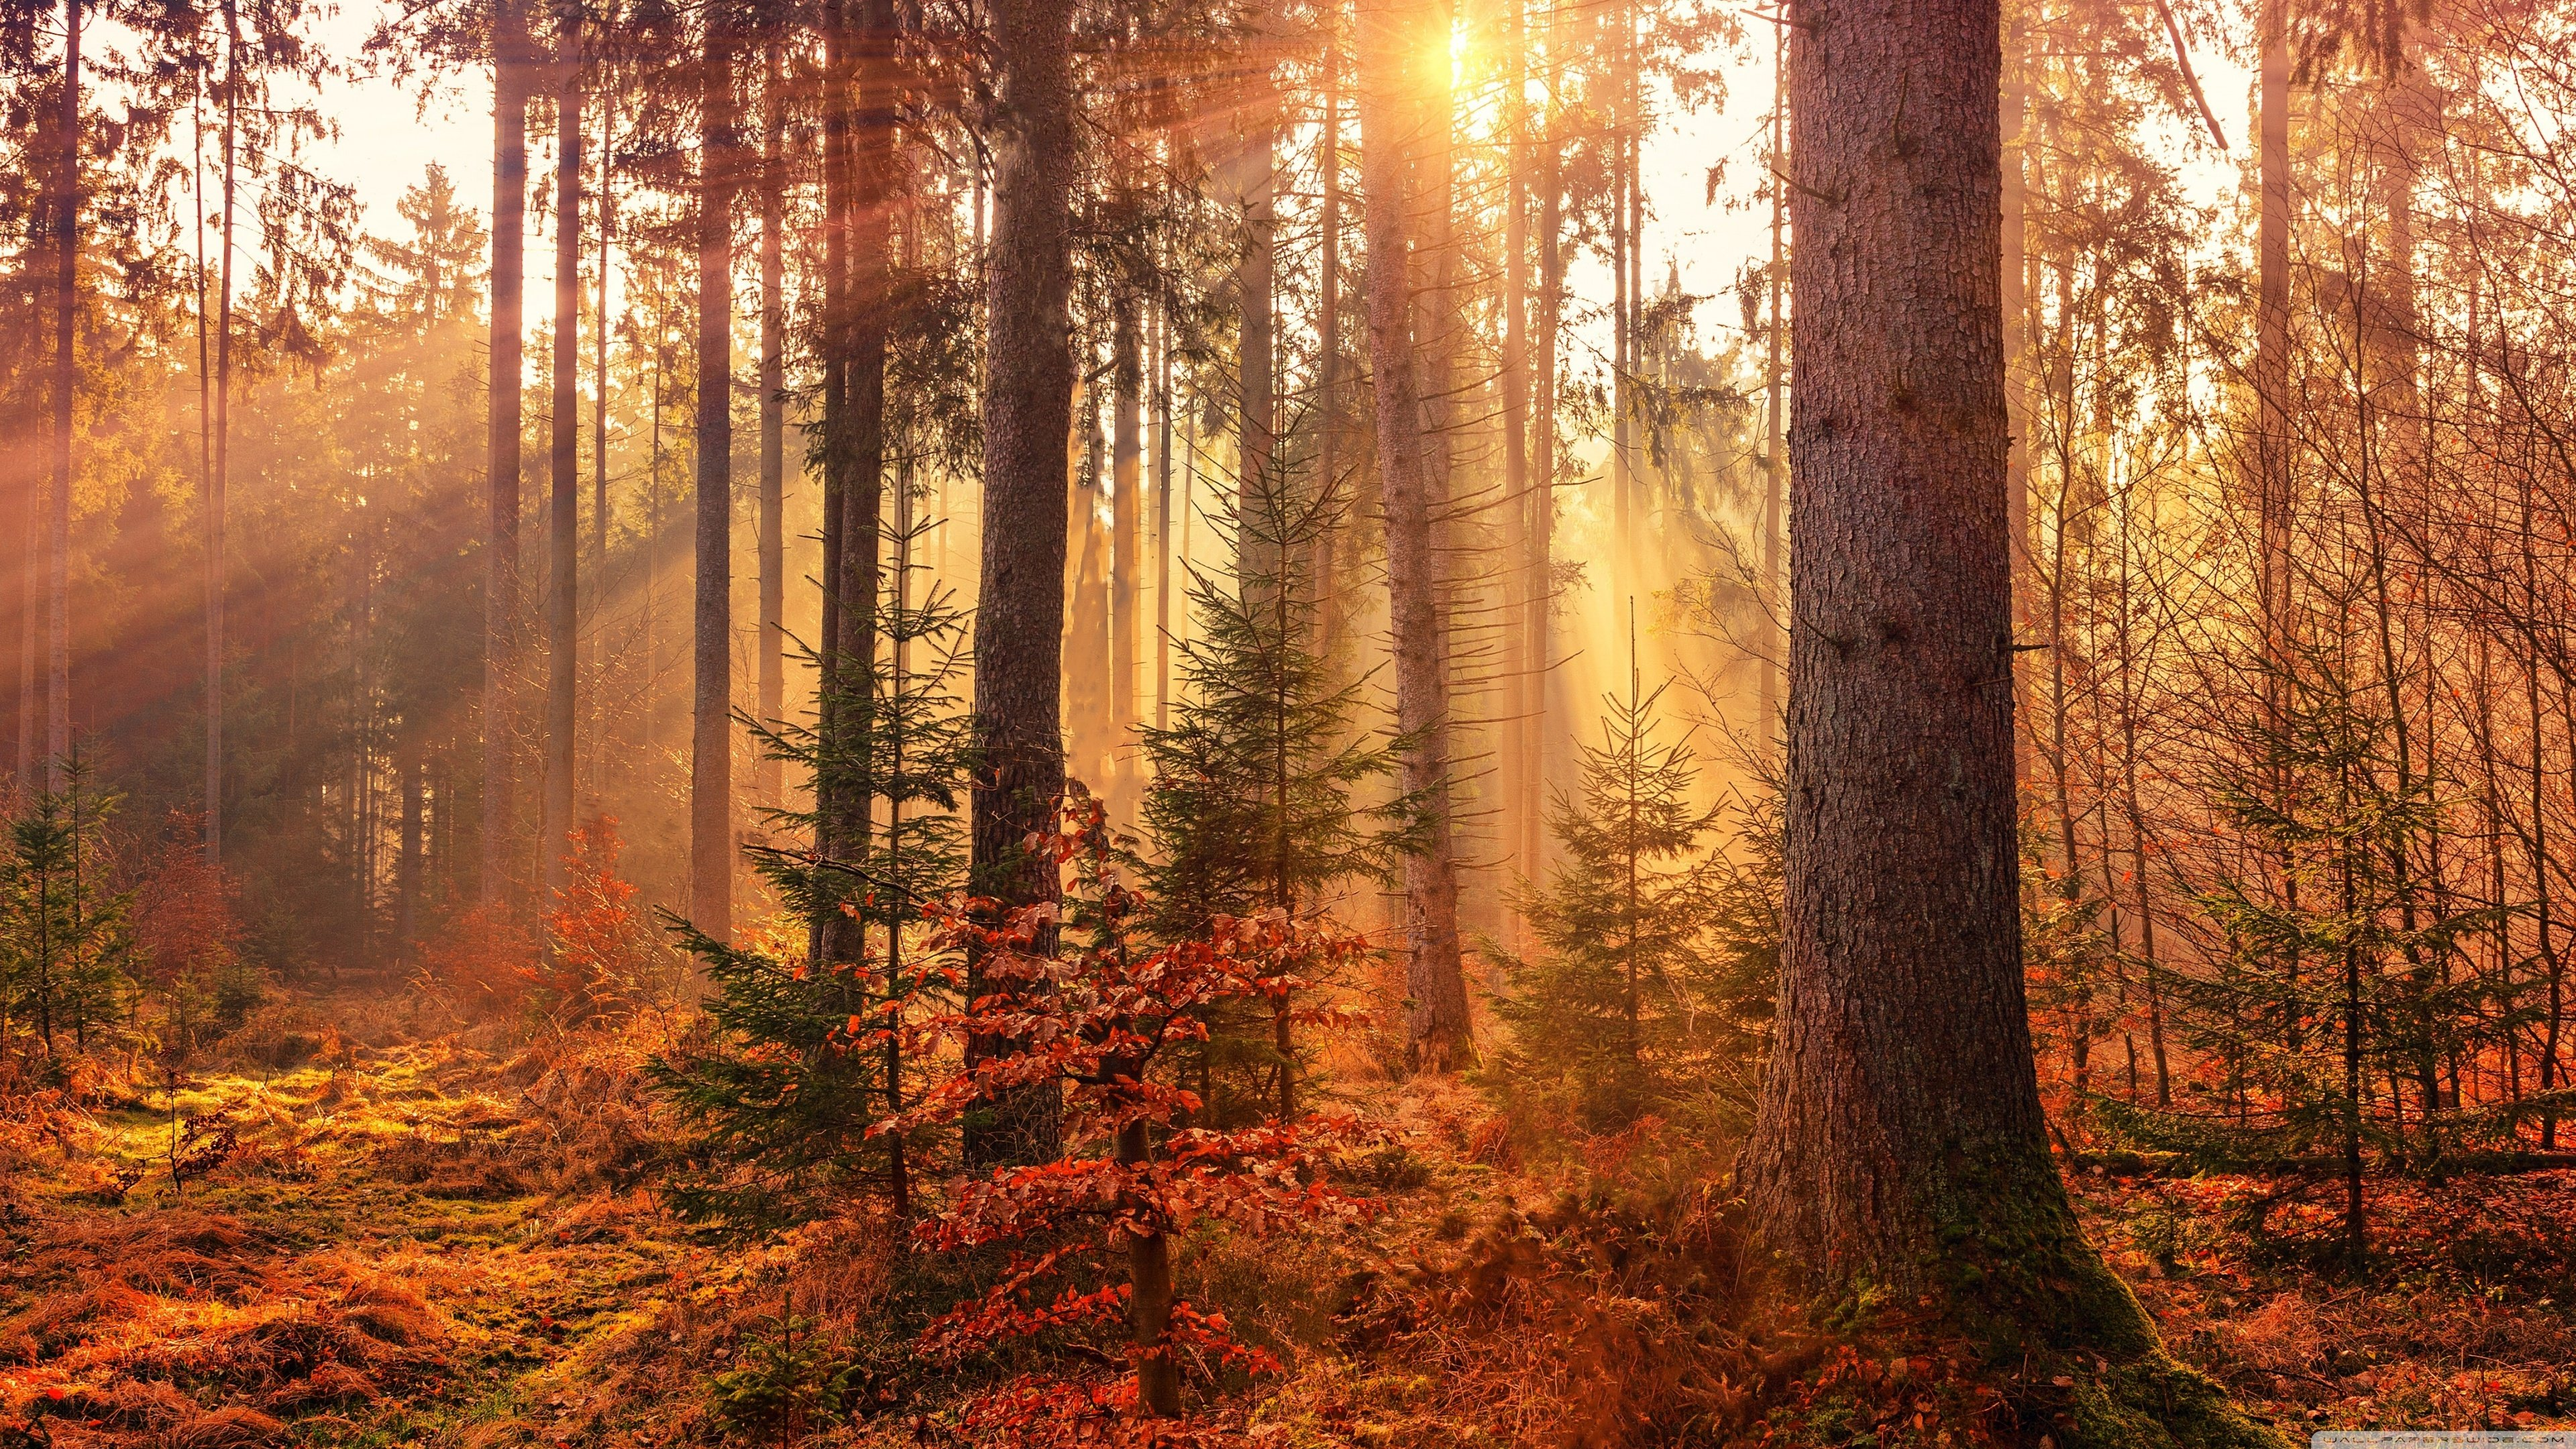 Free Download Autumn Forest Path 4k Hd Desktop Wallpaper For 4k Ultra Hd Tv 3840x2160 For Your Desktop Mobile Tablet Explore 55 Wallpaper Path Wallpaper Path Forest Path Wallpaper